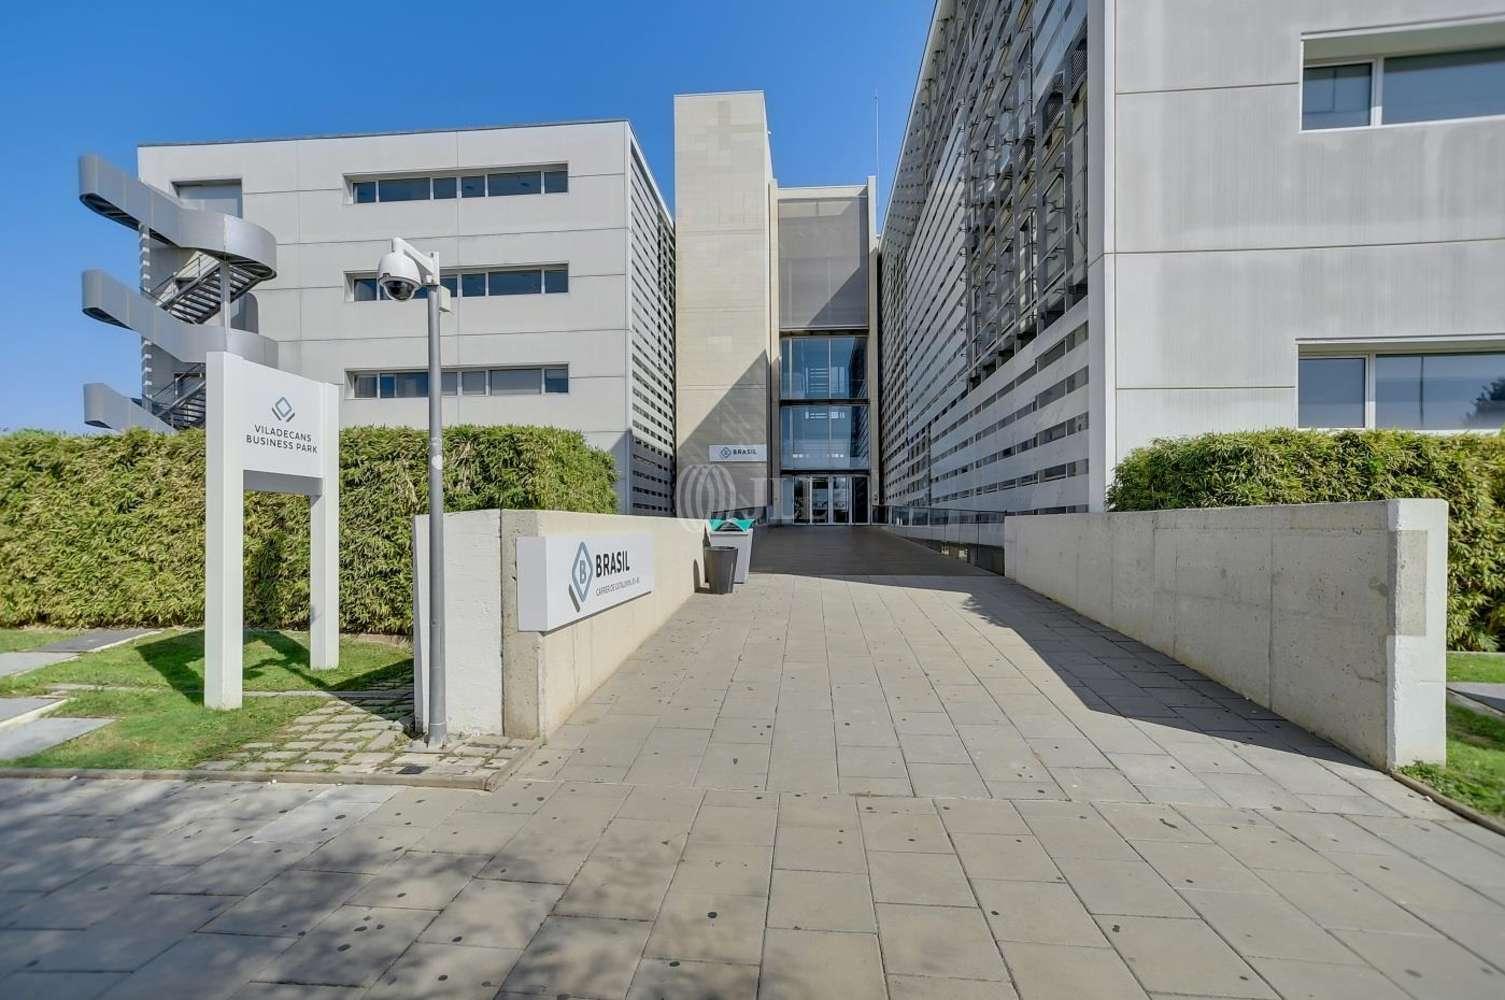 Oficina Viladecans, 08840 - VILADECANS BUSINESS PARK - EDIFICIO BRASIL - 22671